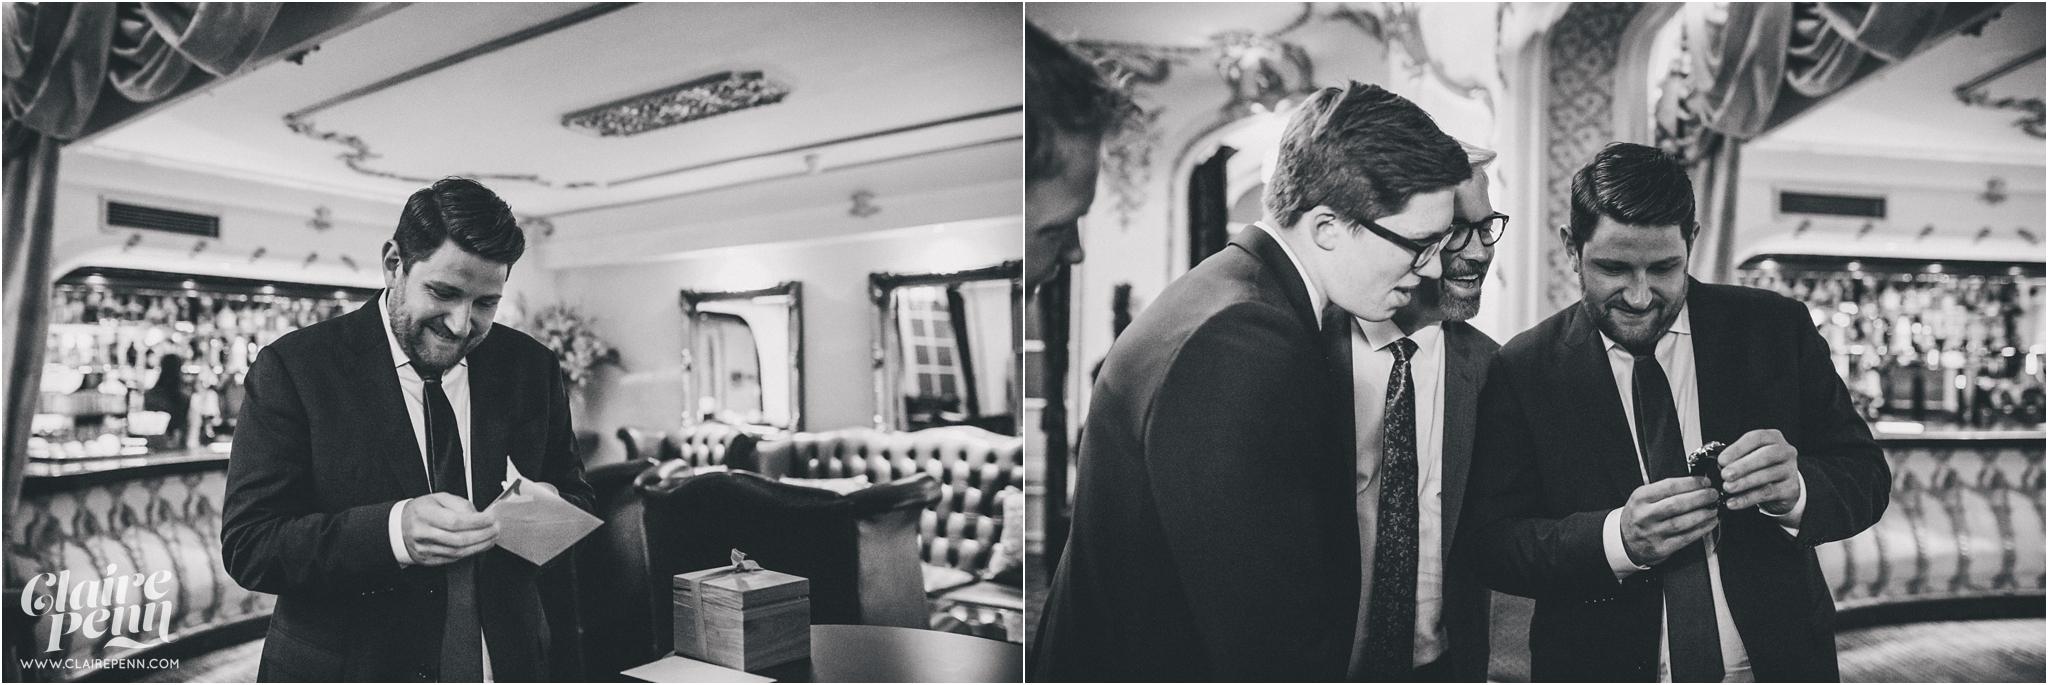 Paradise by way of Kensall Green London pub intimate wedding_0006.jpg